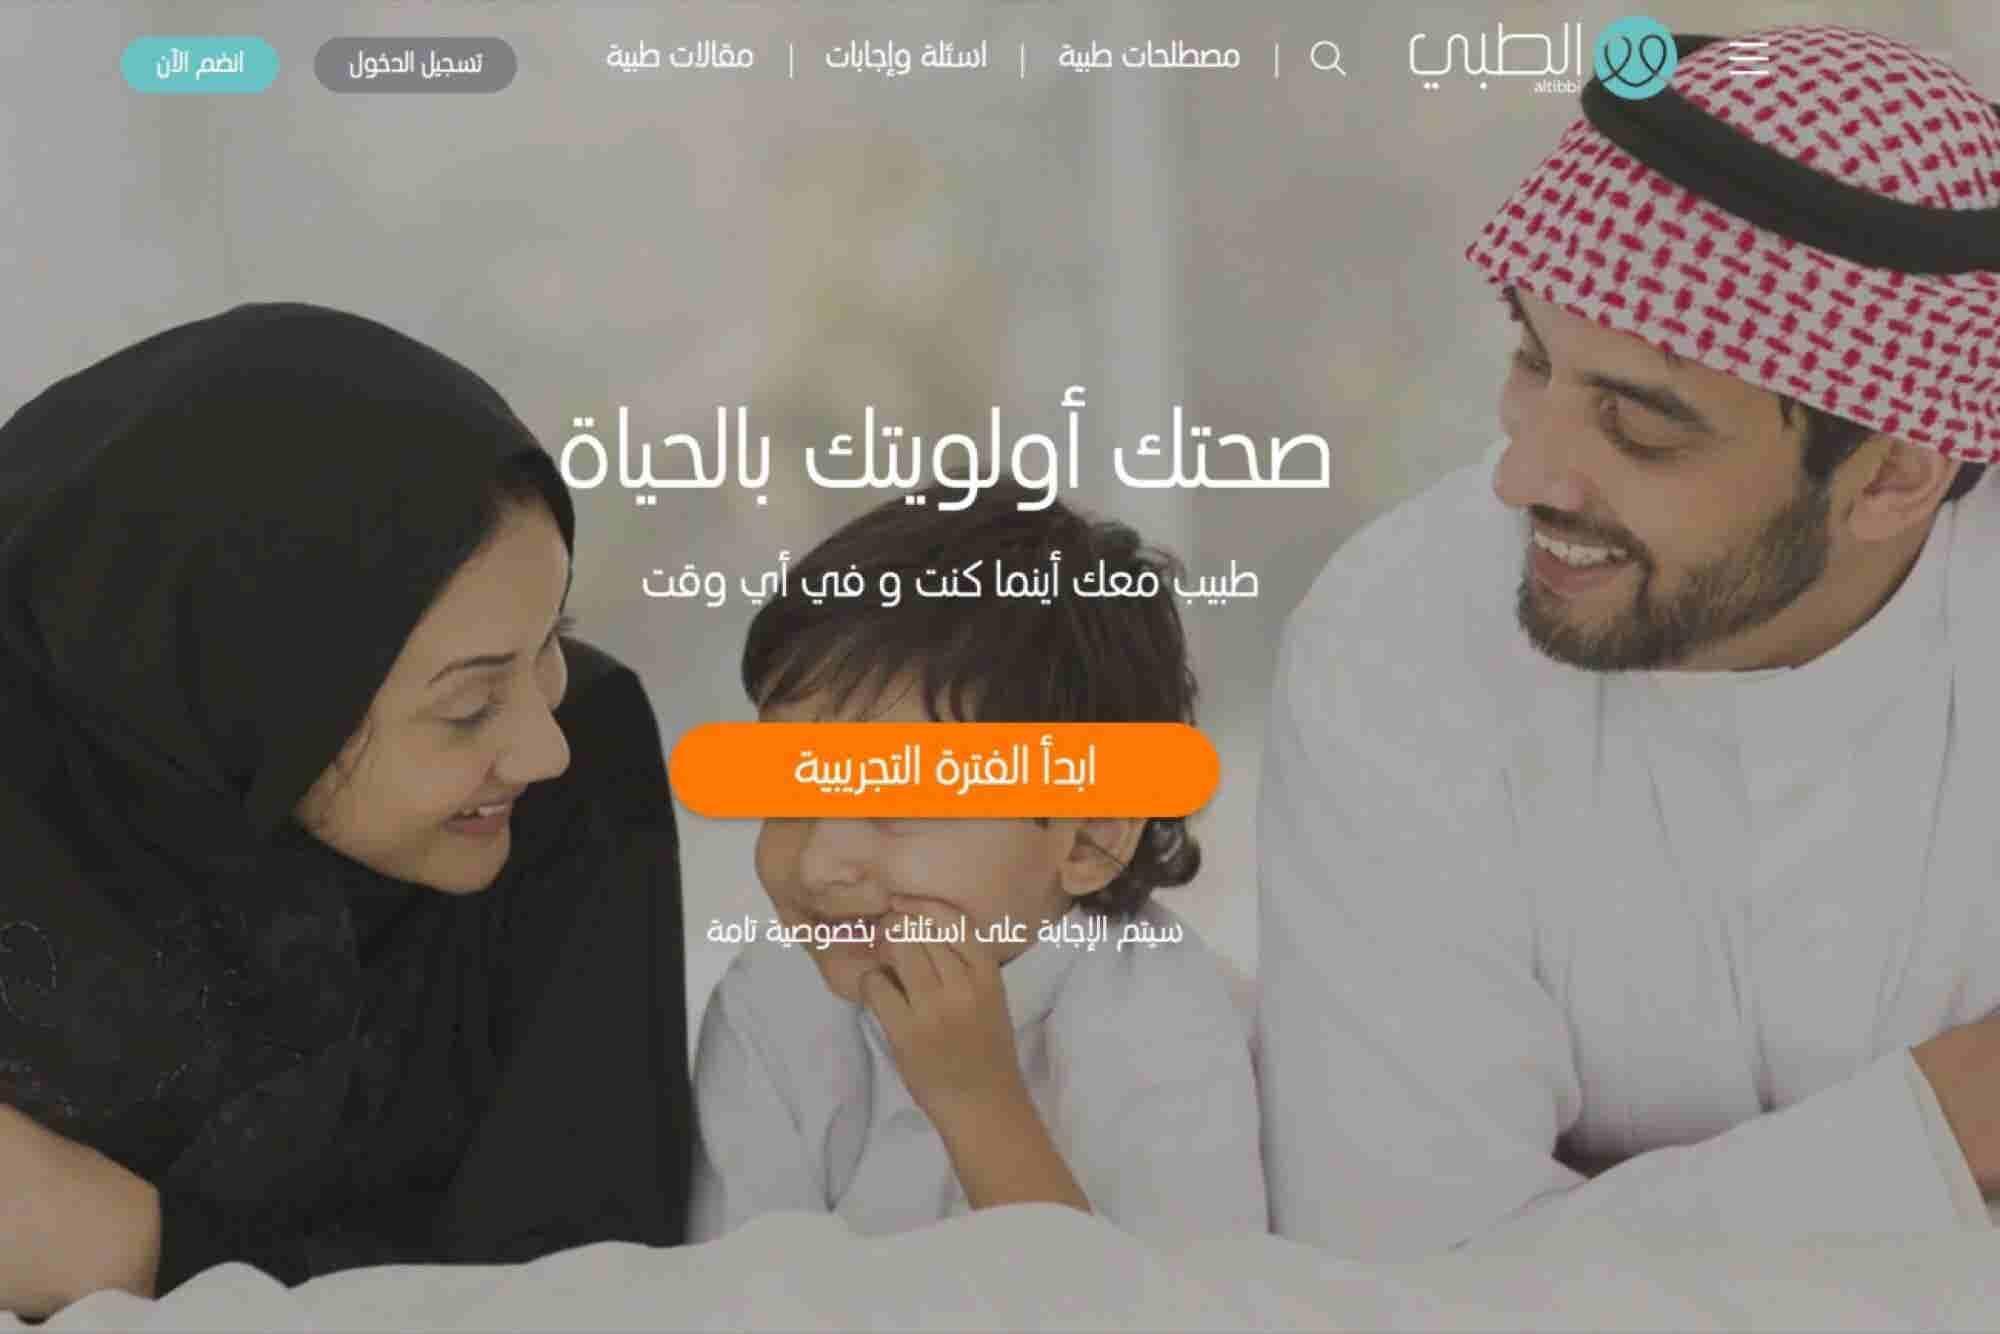 HealthTech Startup Altibbi Raises US$6.5 Million From DASH Ventures, MEVP And Others